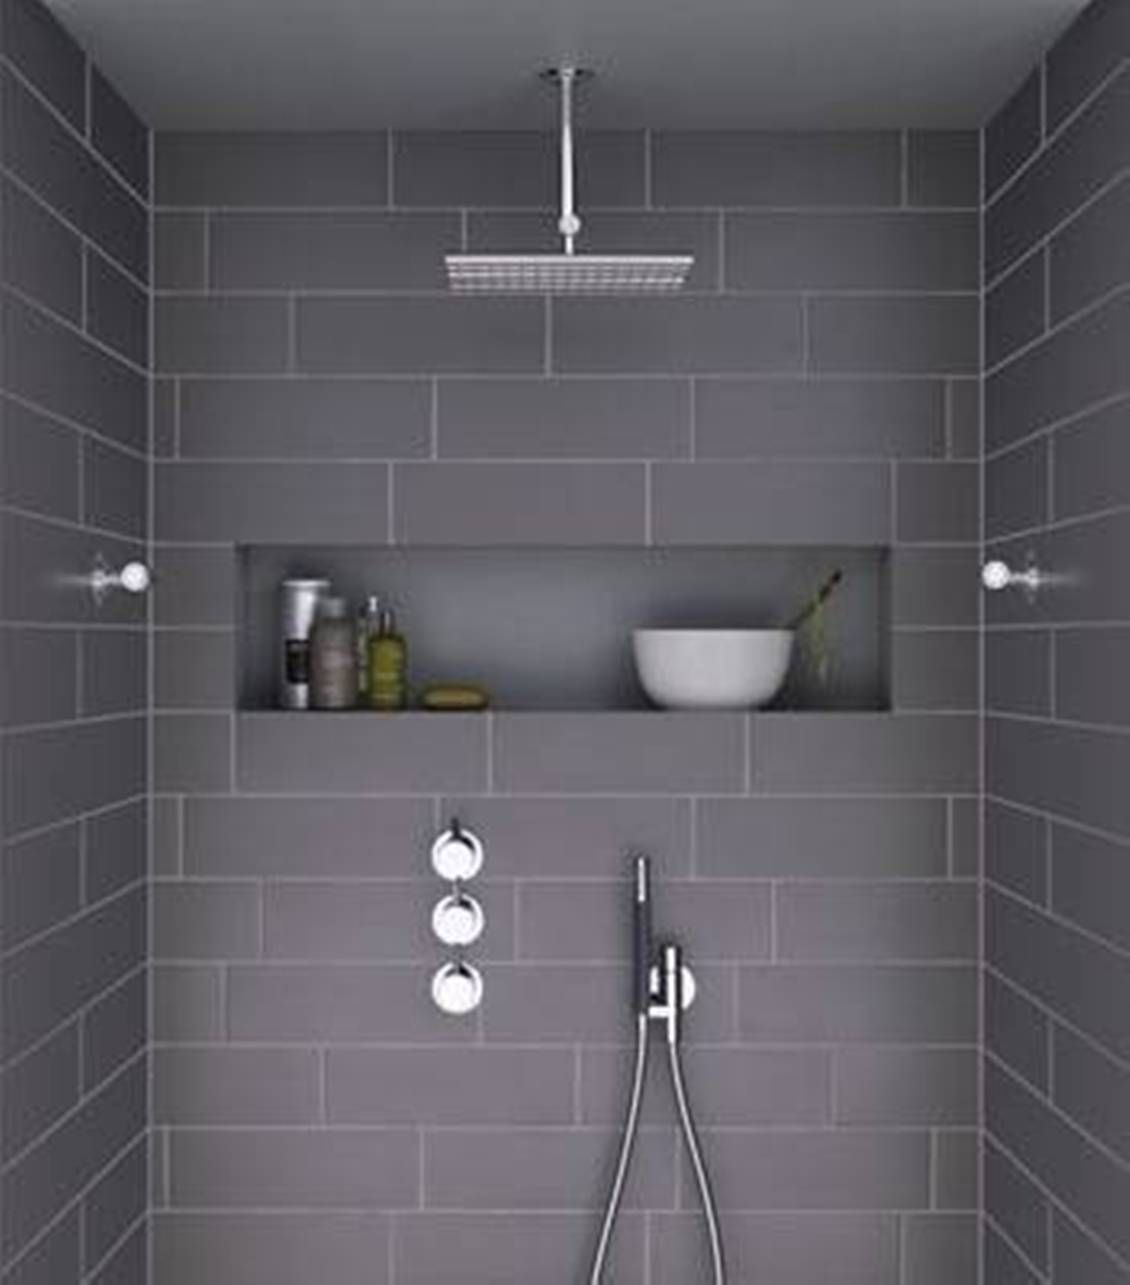 Rain shower head ceiling mount google search bathroom ideas rain shower head ceiling mount google search dailygadgetfo Choice Image